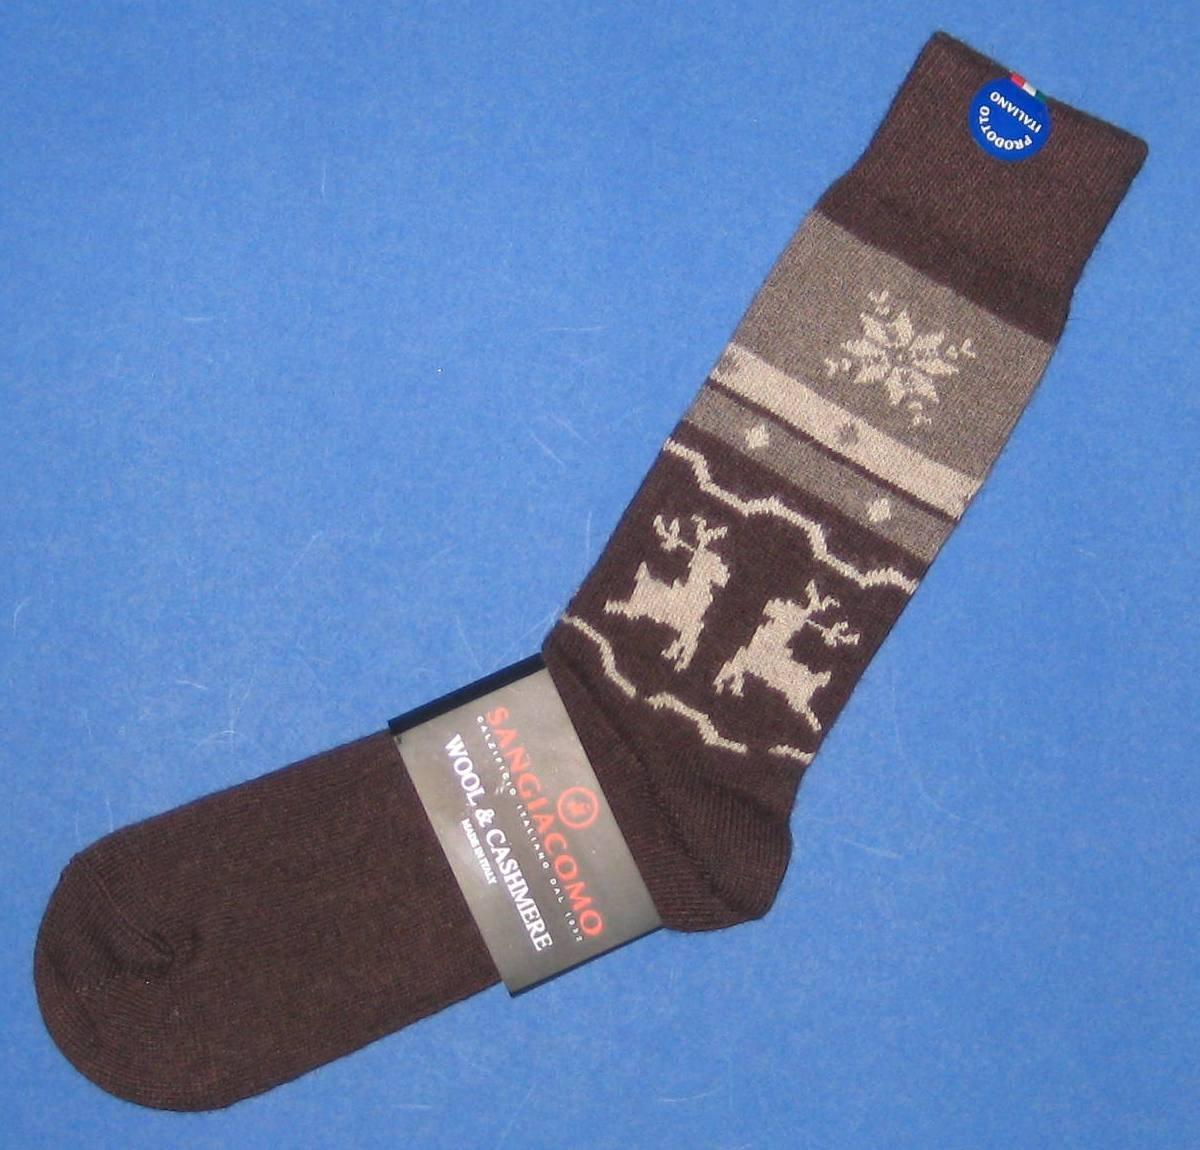 NWT Sangiacomo Brown Merino Wool & Cashmere Snowflake Reindeer Knit Dress Socks